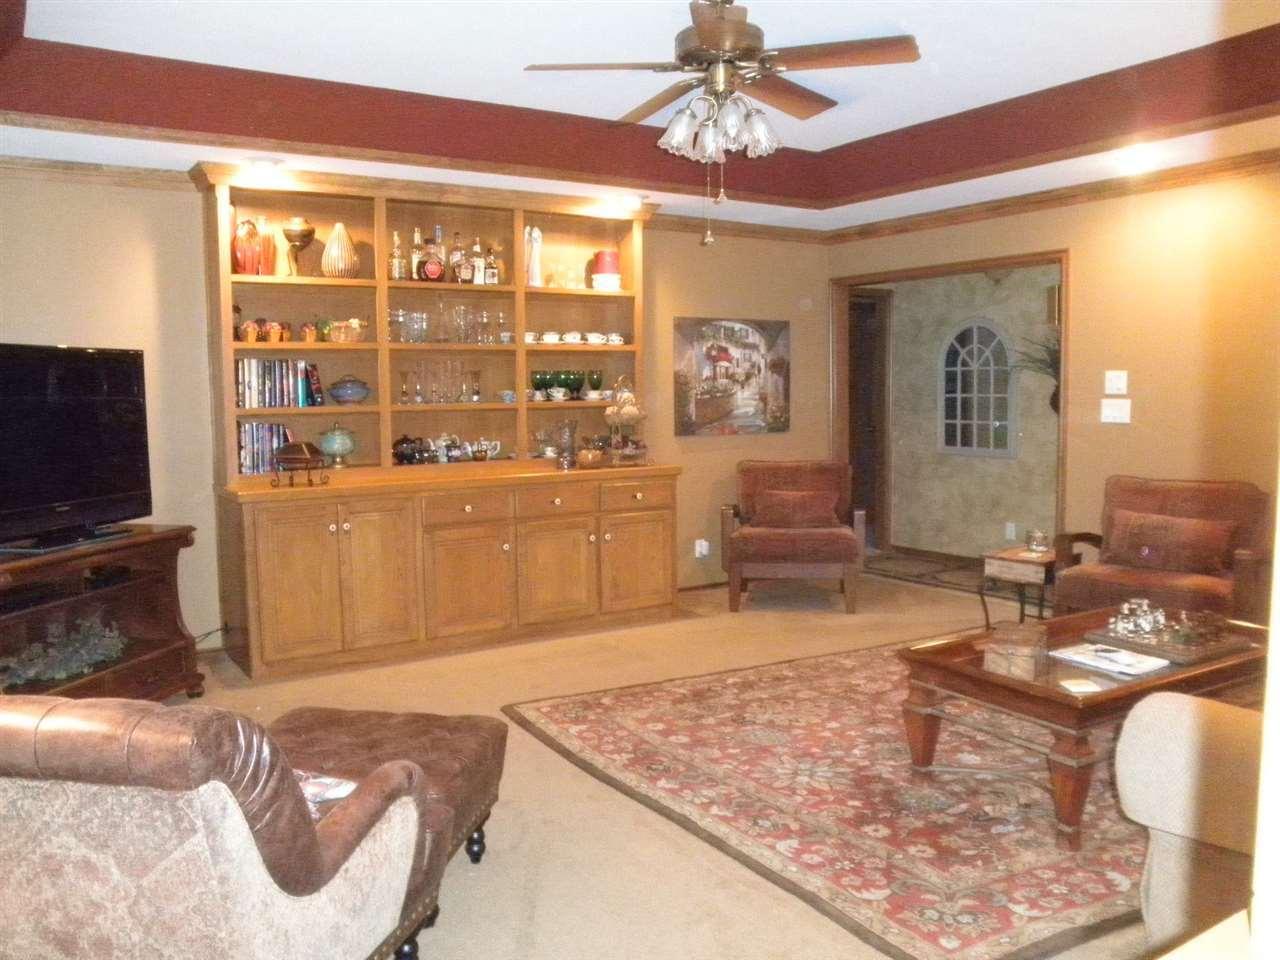 Sold Intraoffice W/MLS | 2800 Green Meadow Ponca City, OK 74604 5